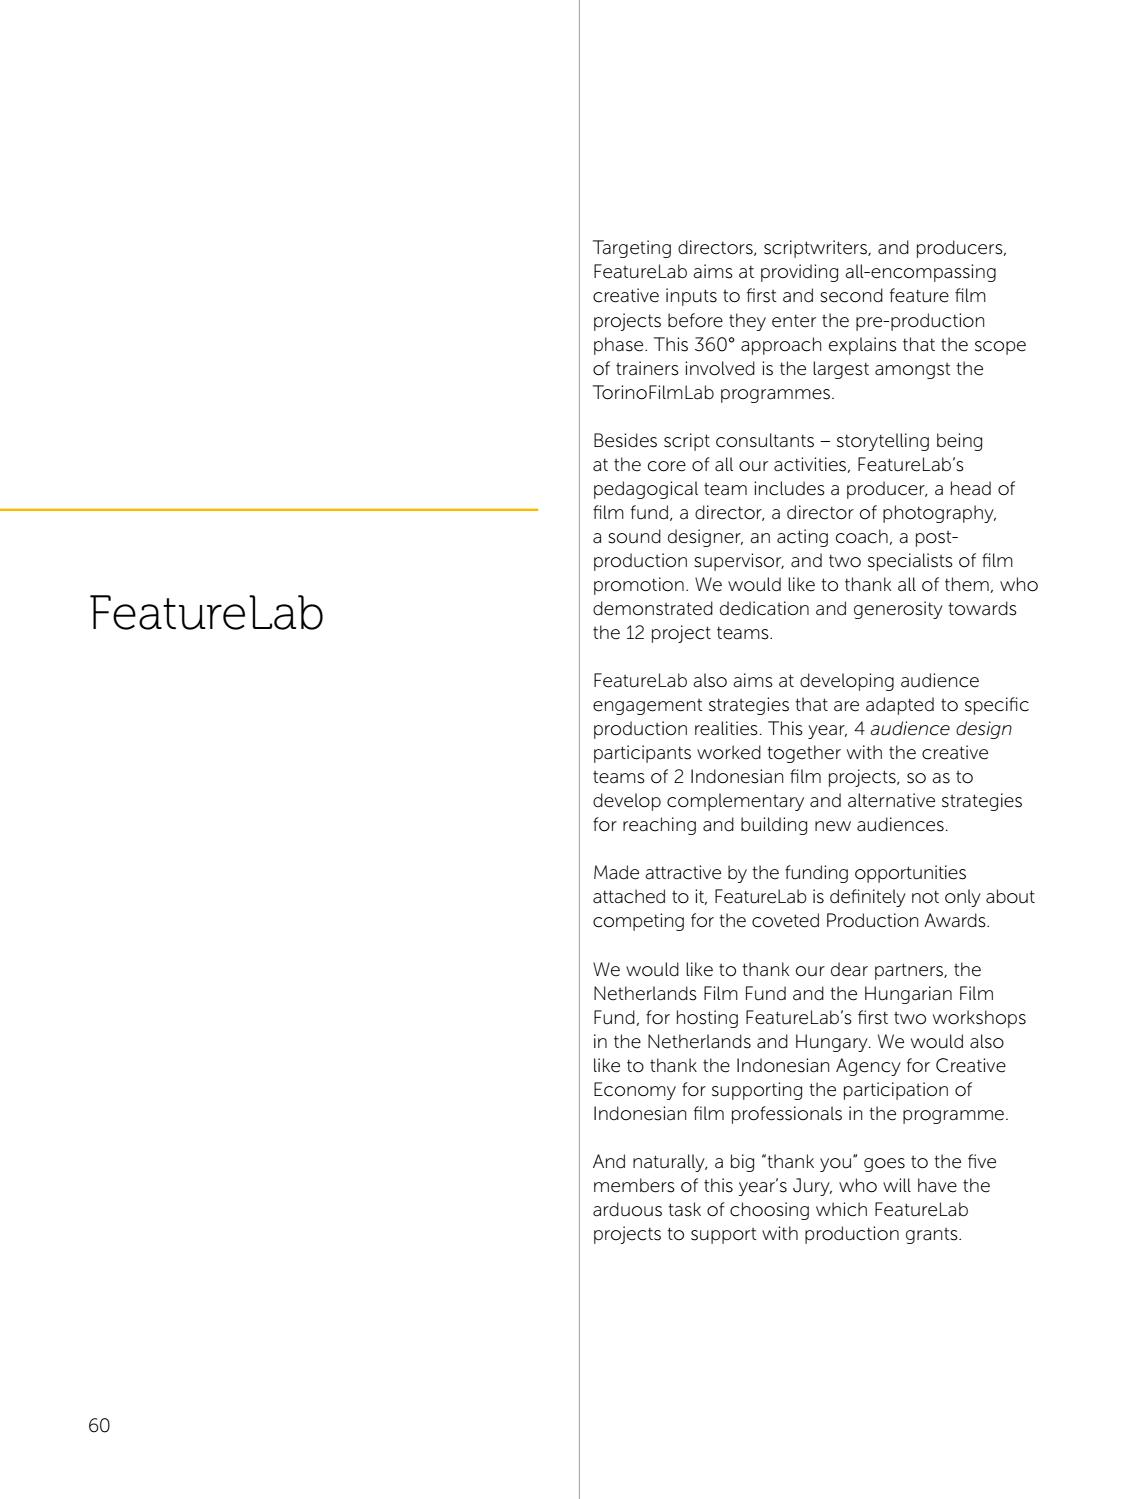 TFL catalogue 2017 by TorinoFilmLab - issuu